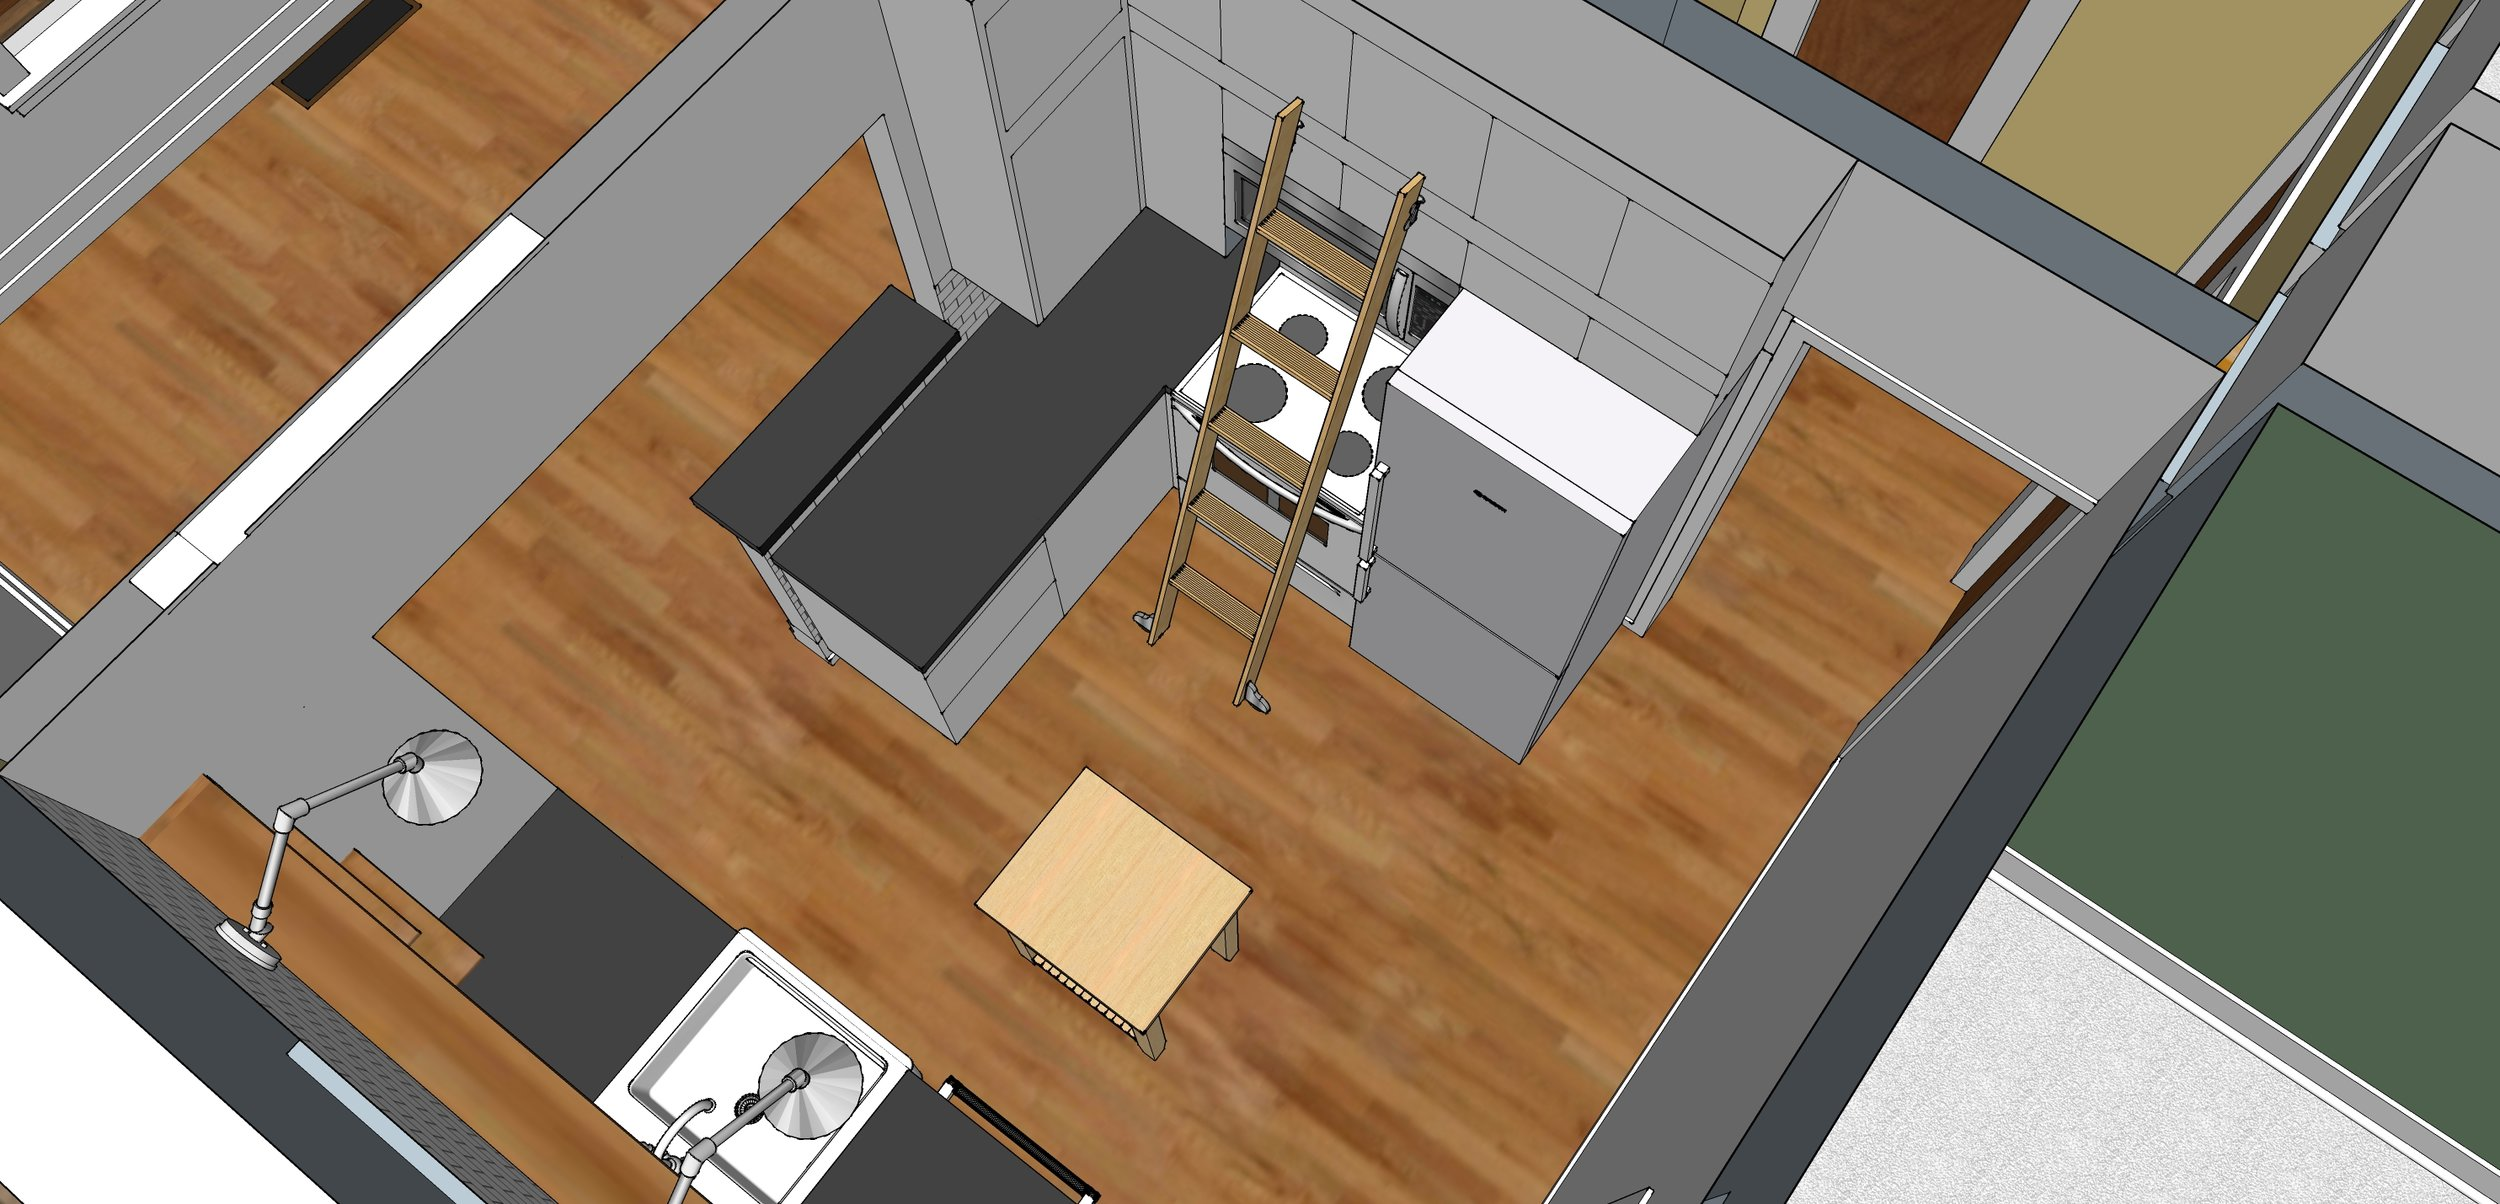 Option-2-Screen-shot-1.jpg